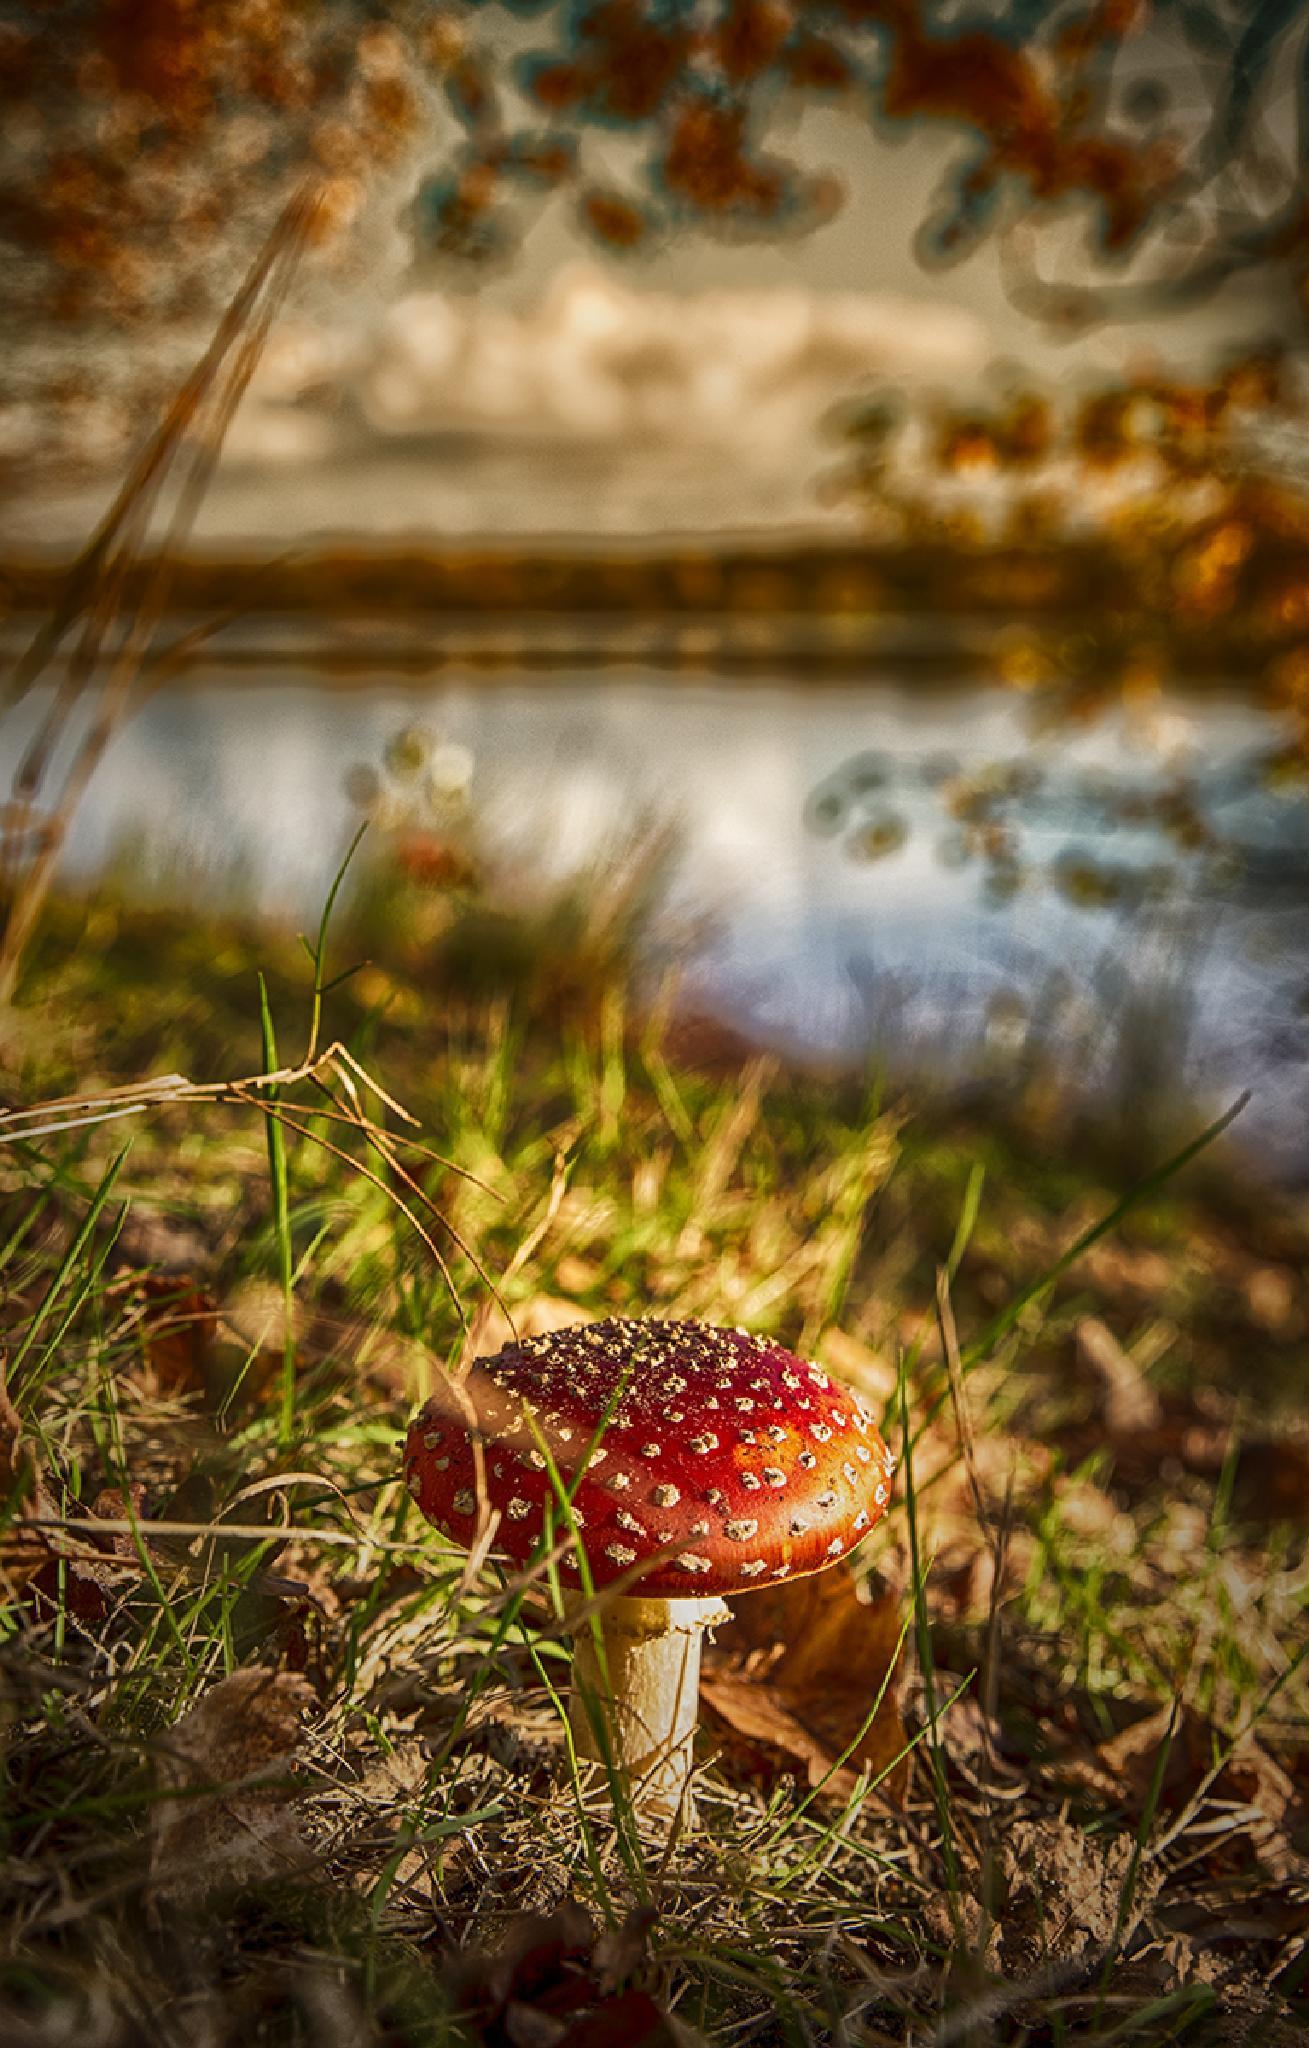 Mushroom at a lake by egonzitter